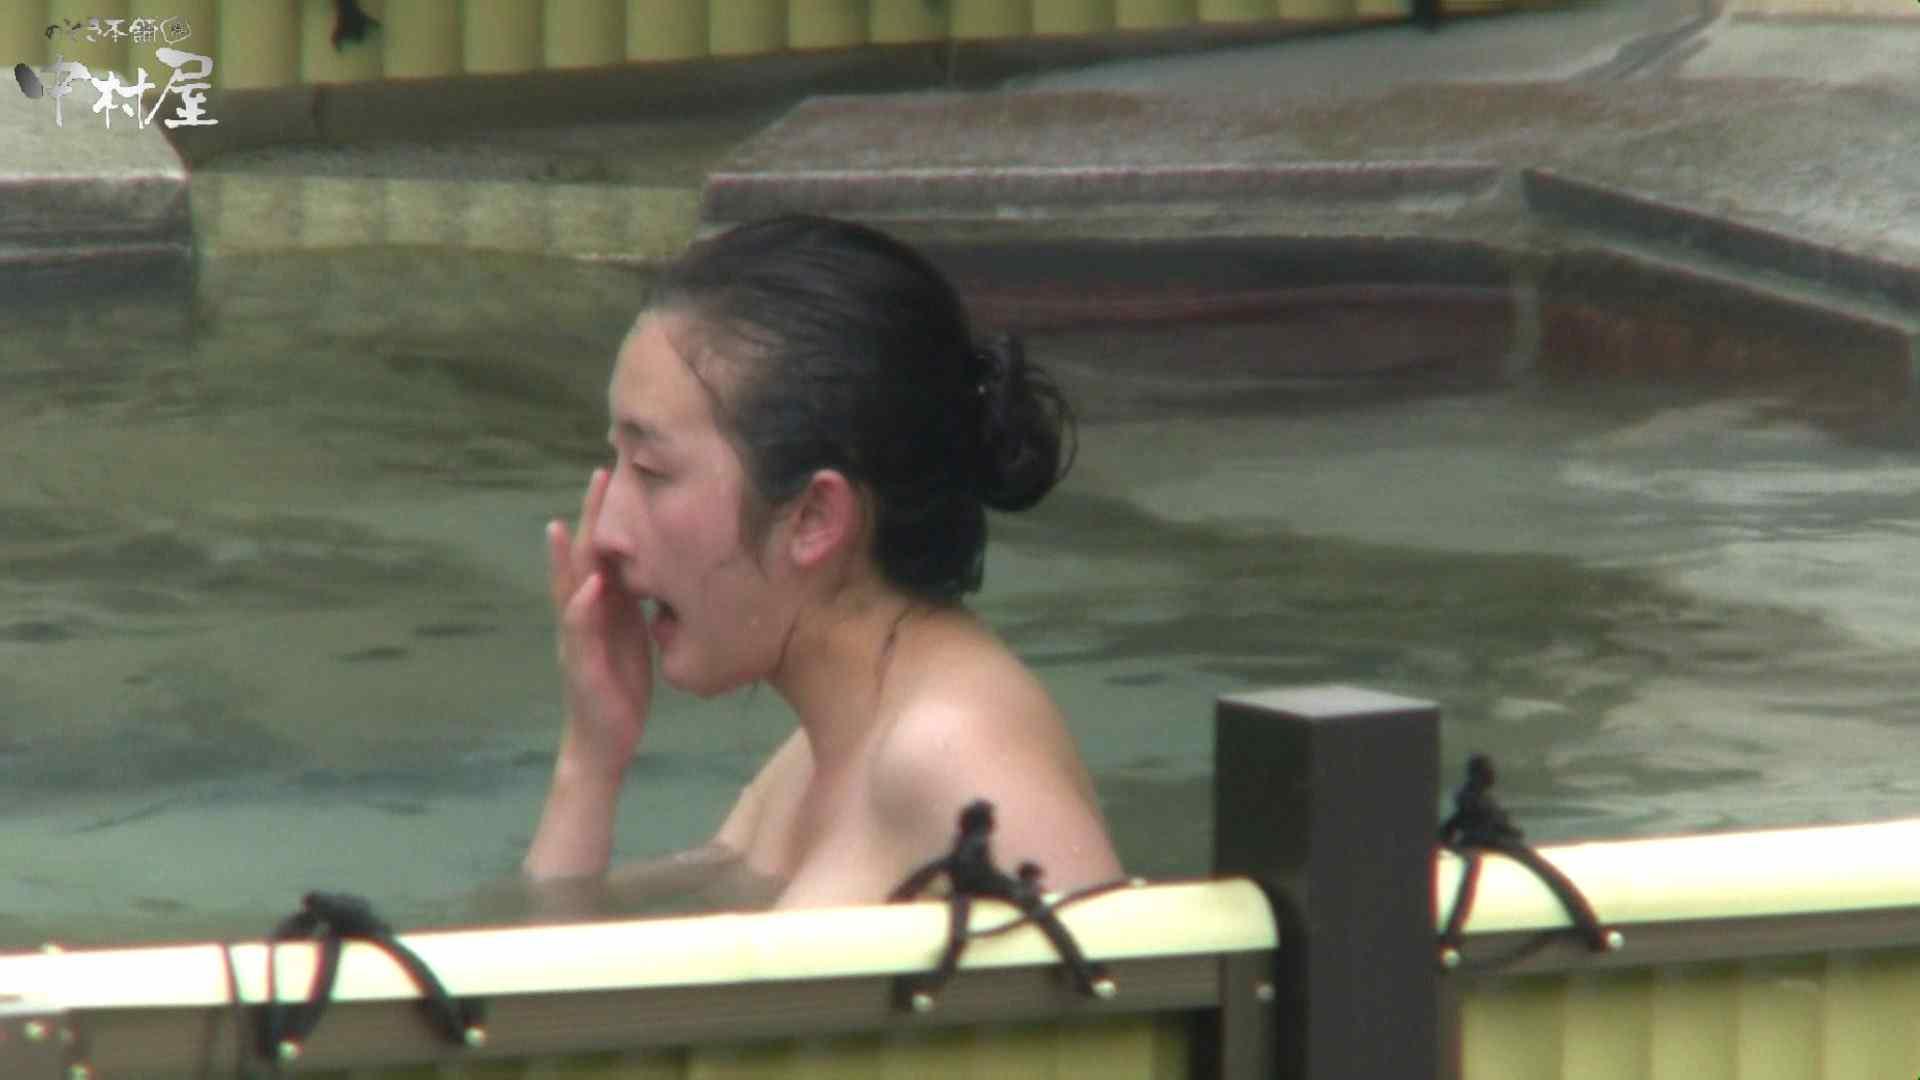 Aquaな露天風呂Vol.949 盗撮   OLセックス  92画像 43